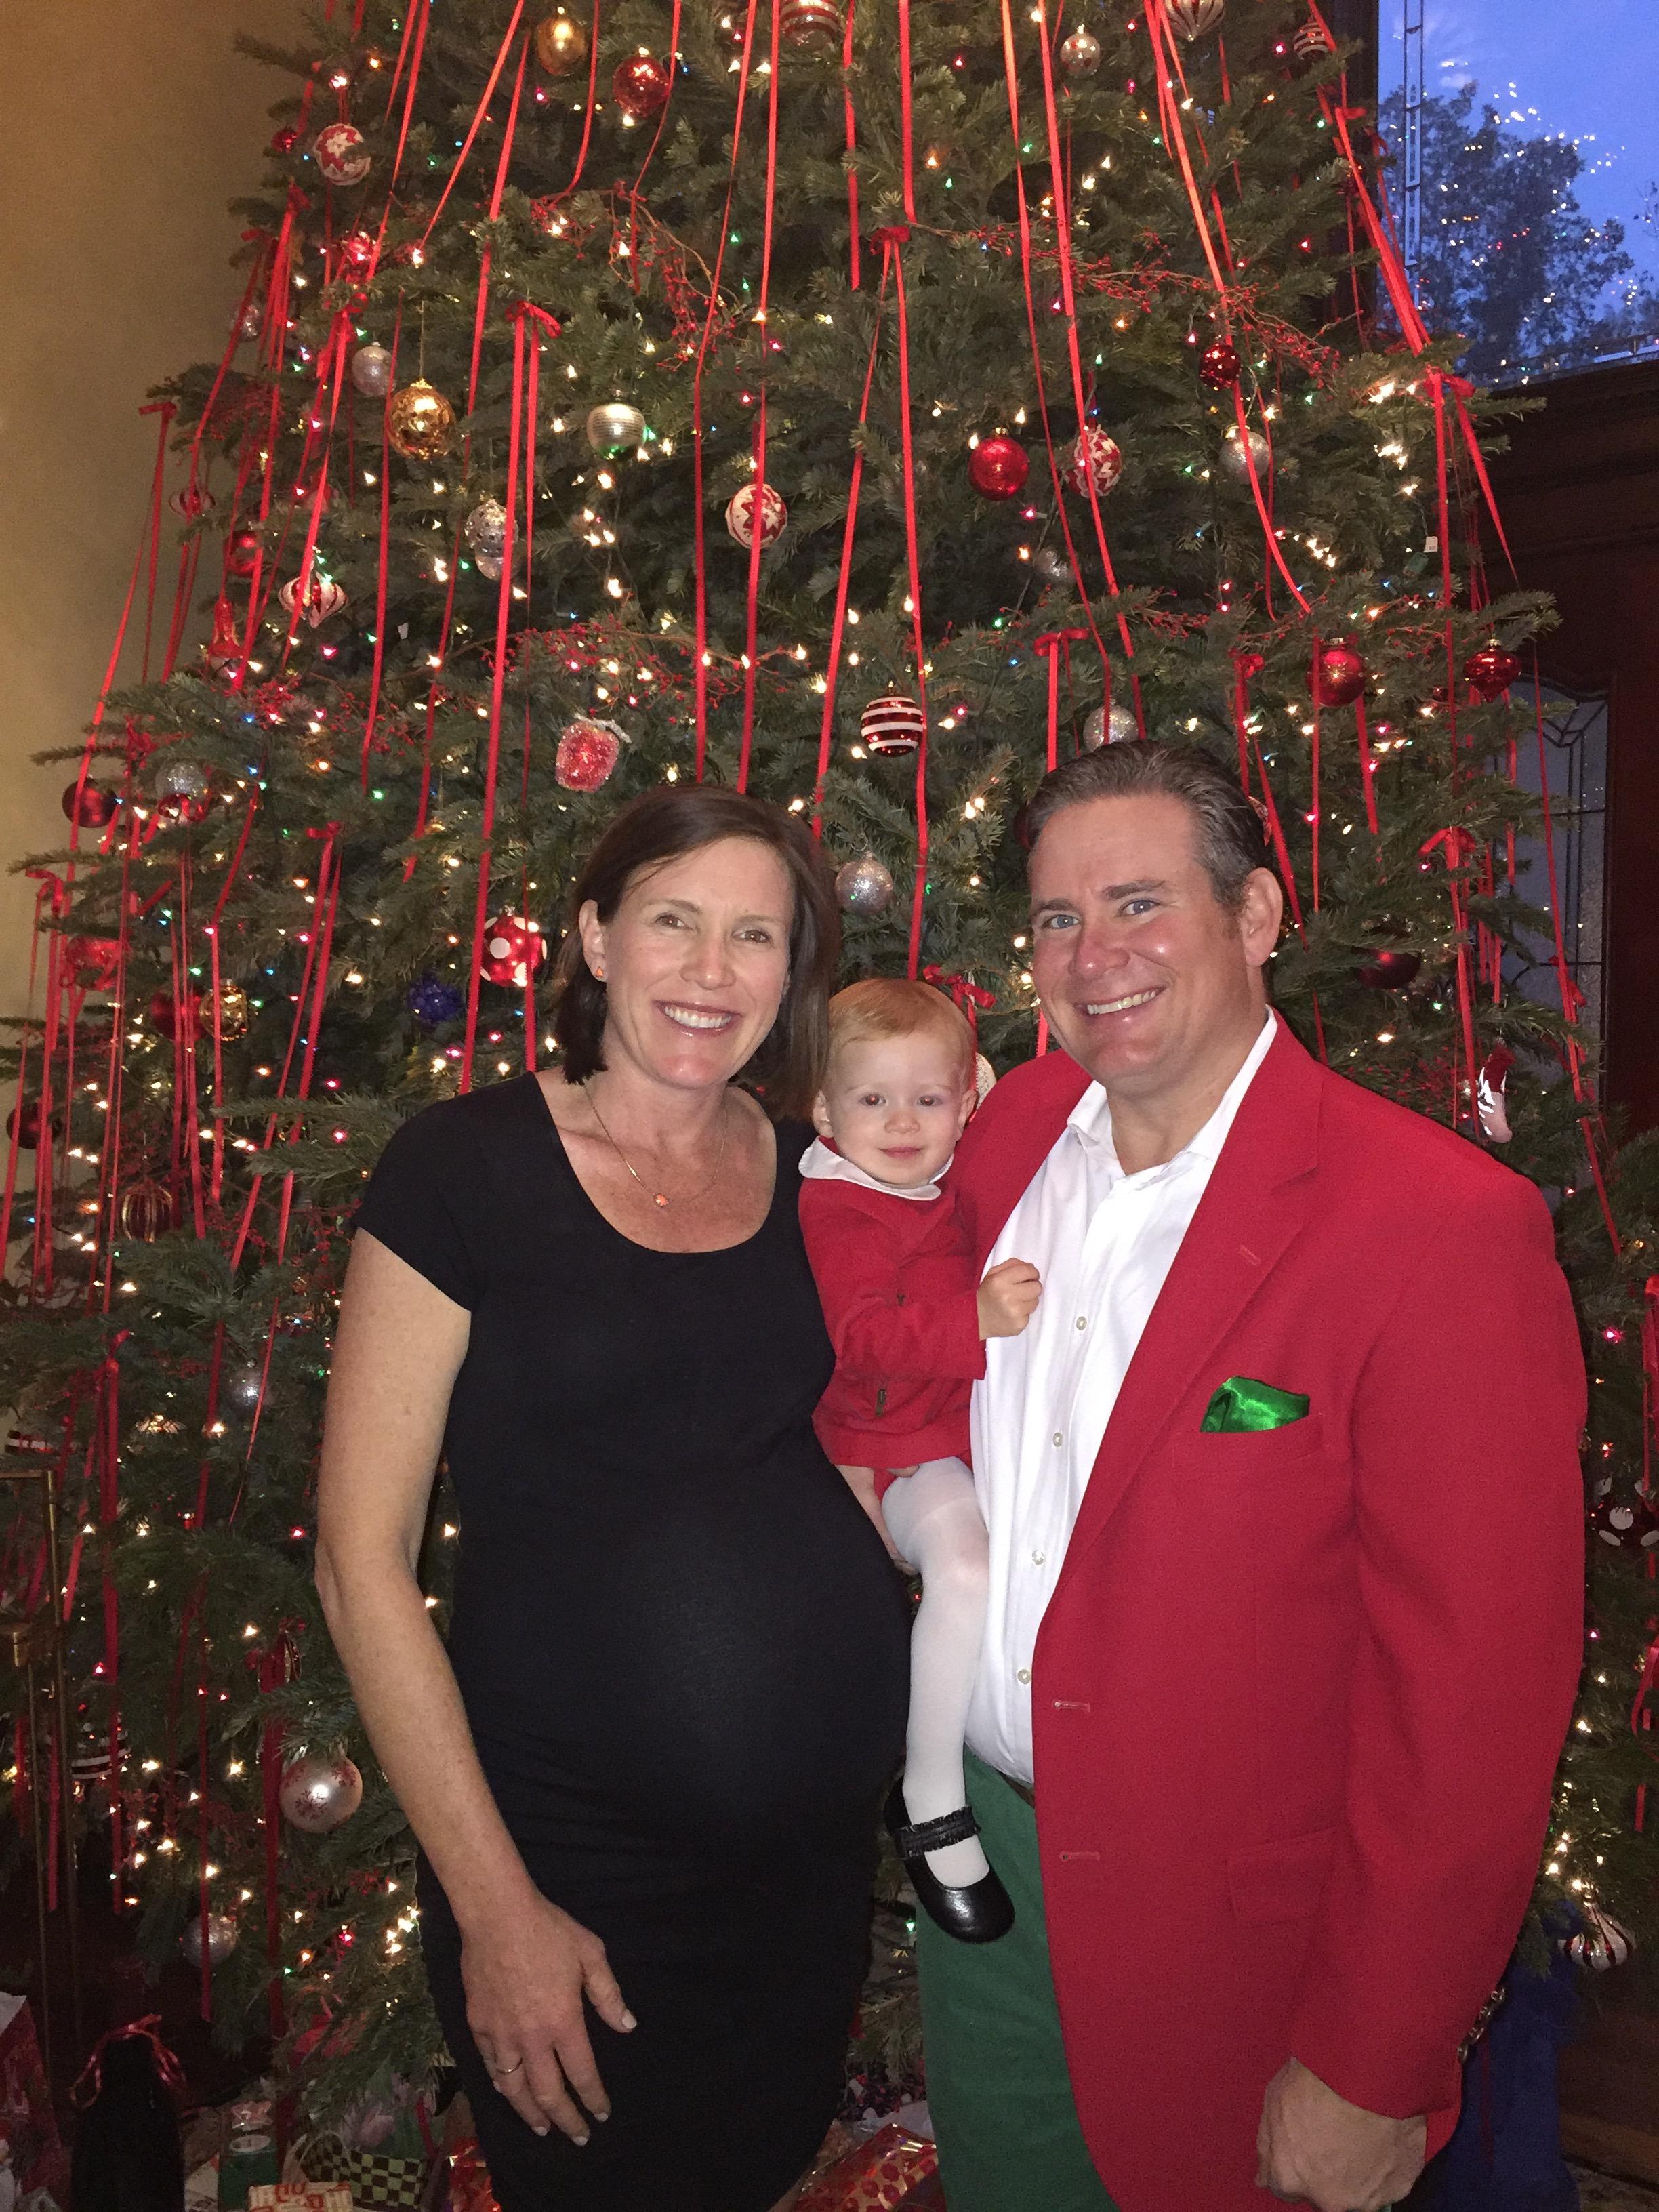 Christmas Day 2015 - 32 Weeks